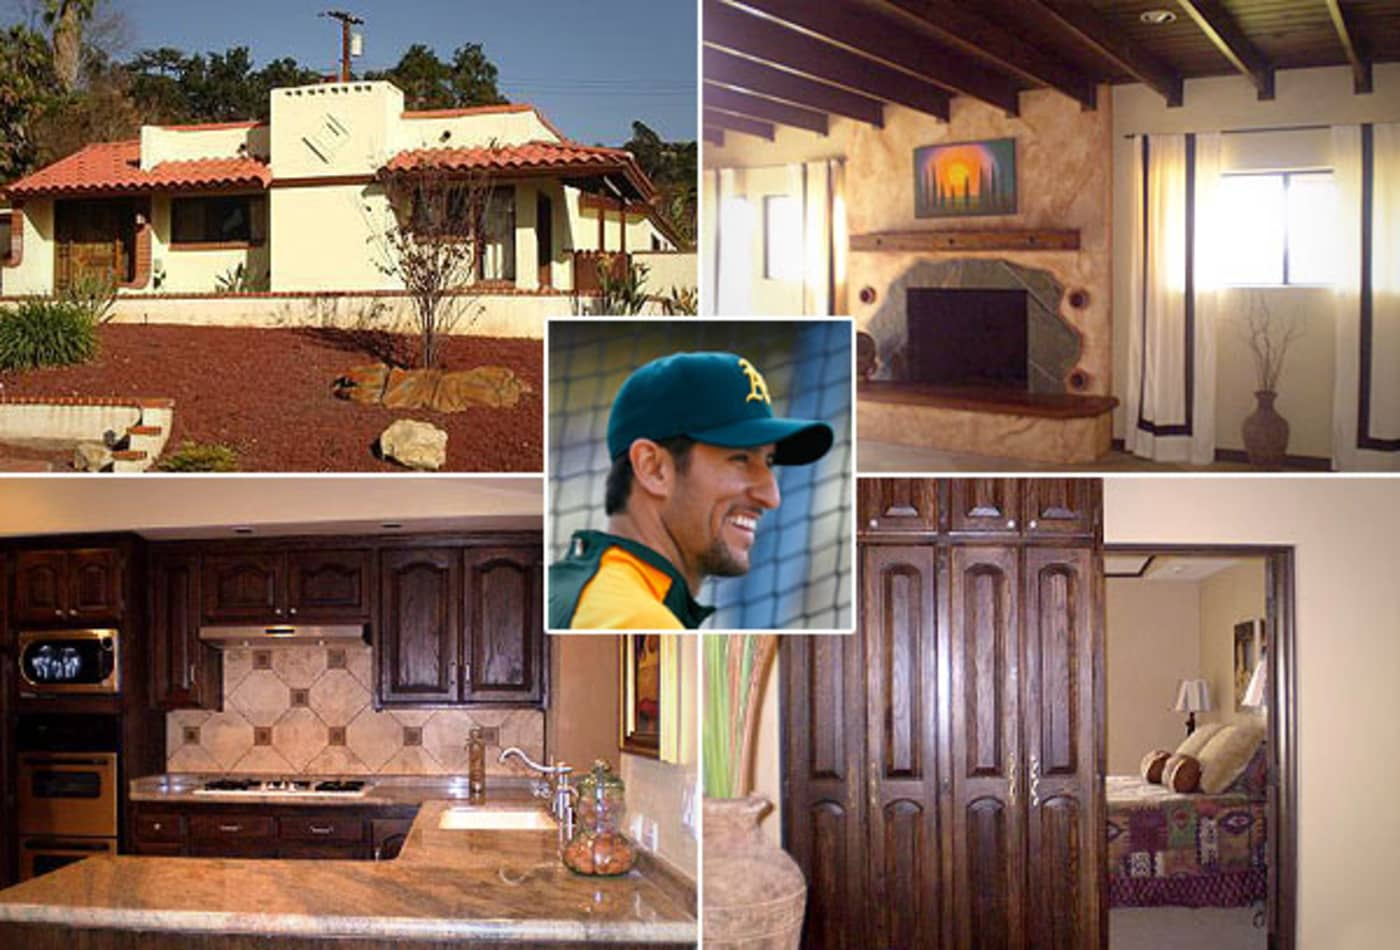 Nomar-Garciaparra-Baseball-Homes-CNBC.jpg